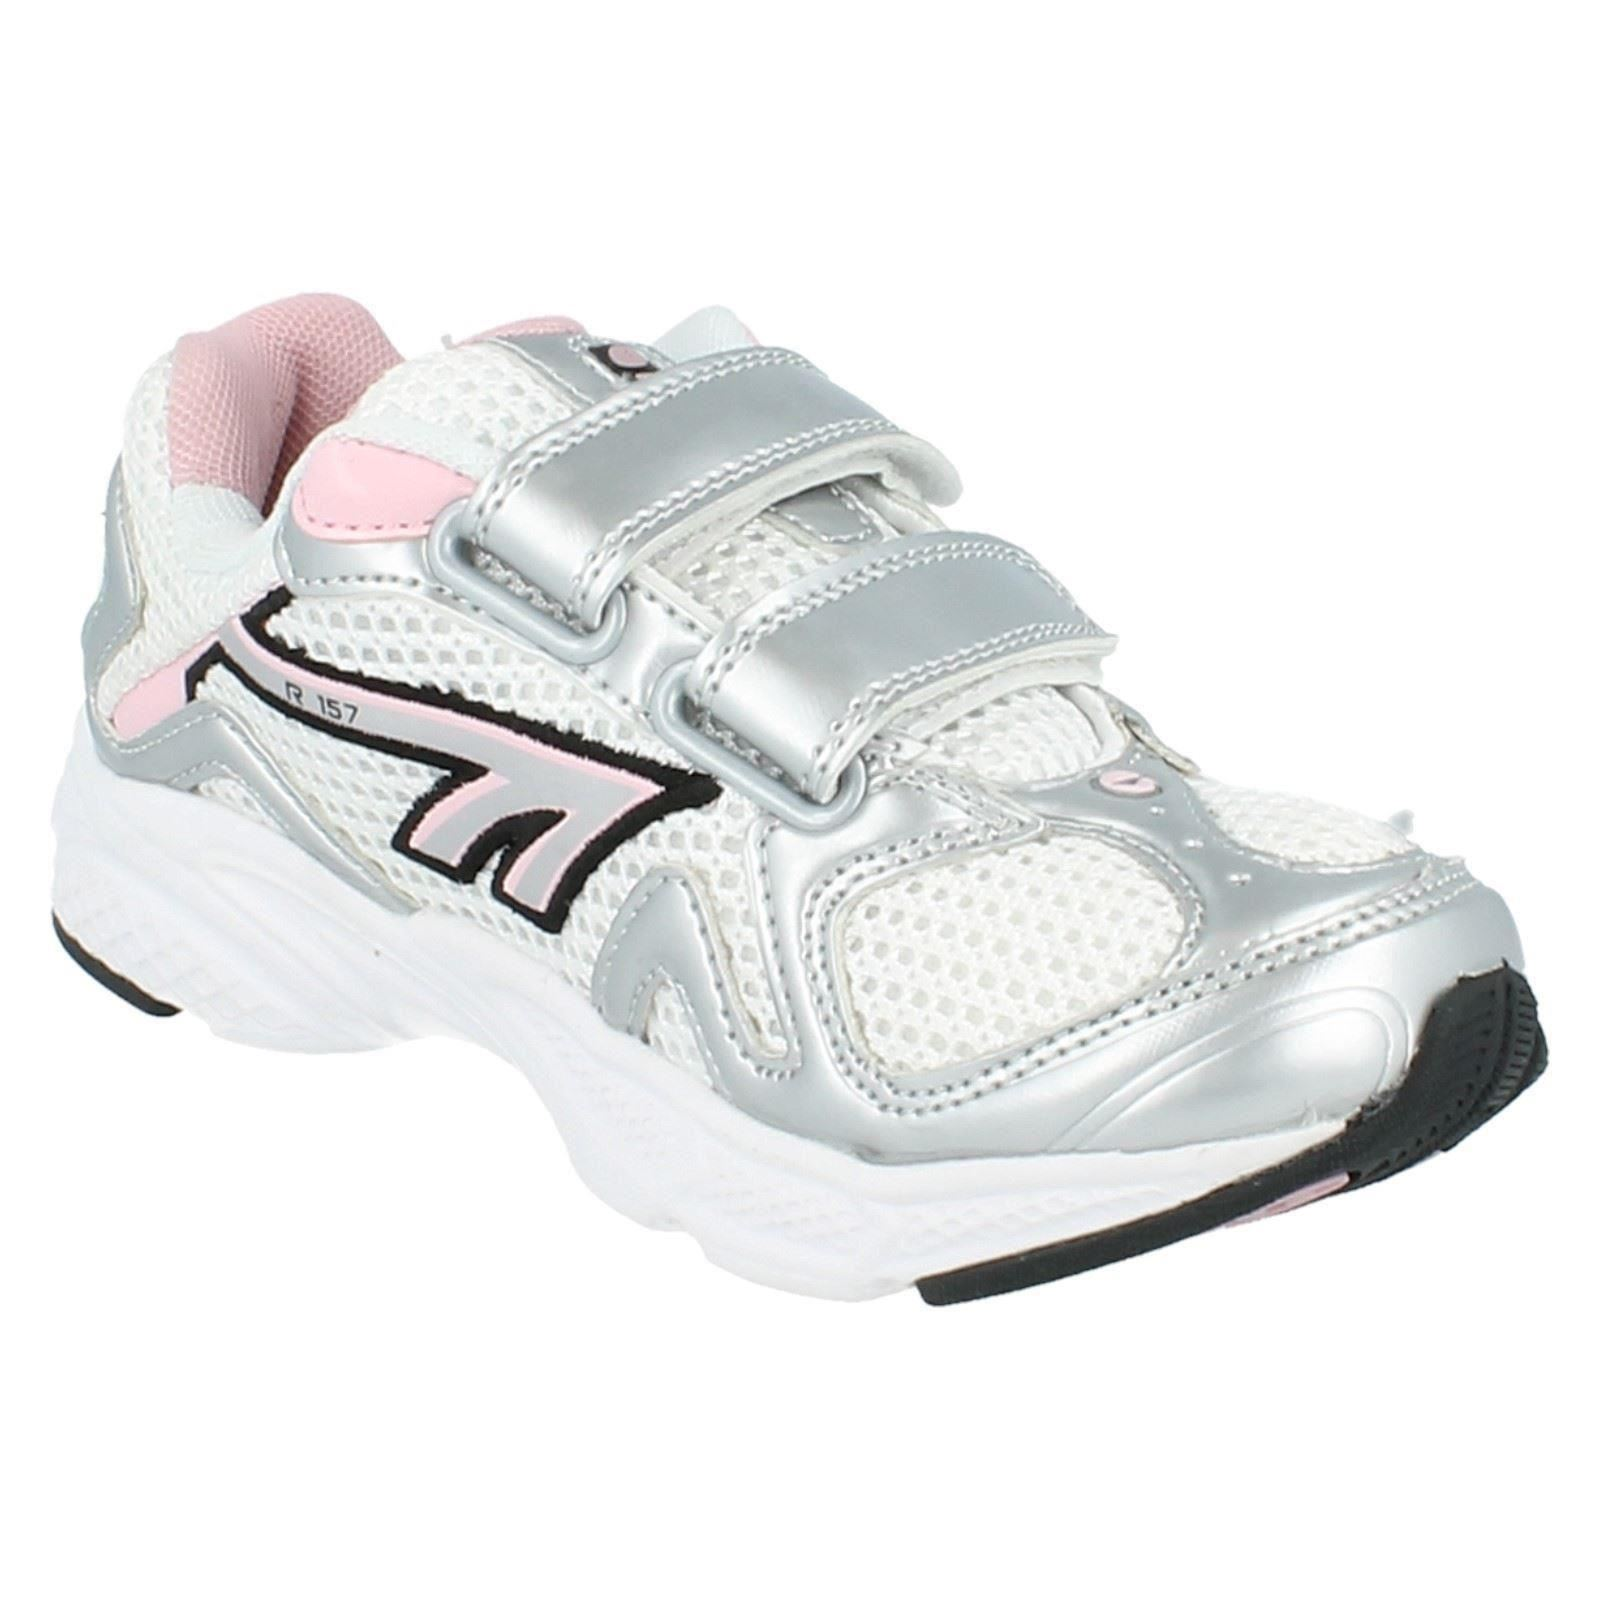 Girls Hi-Tec Trainers Style - R157 JRG EZ